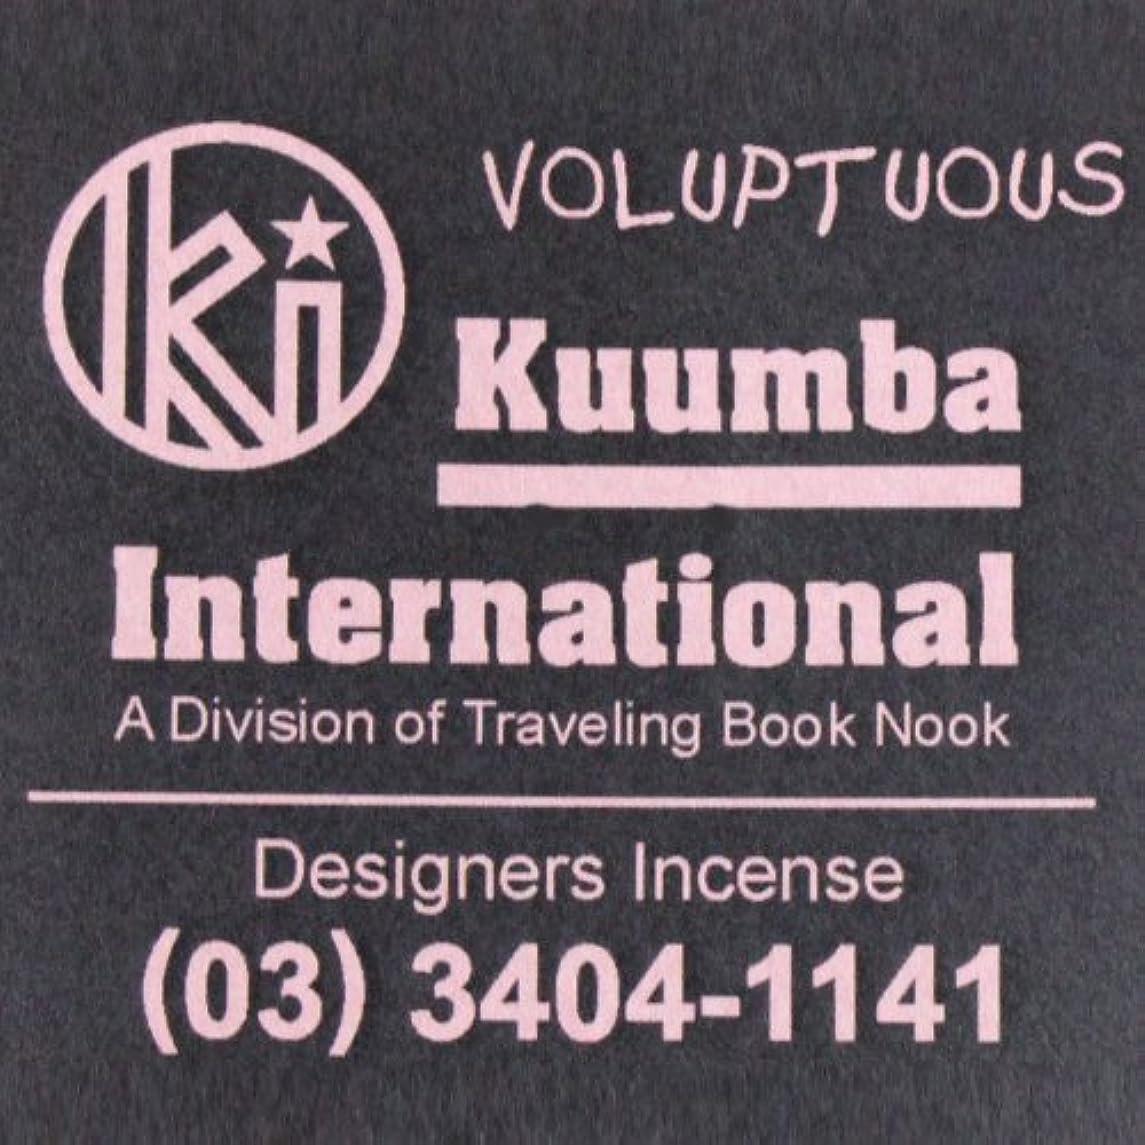 KUUMBA (クンバ)『incense』(VOLUPTUOUS) (Regular size)